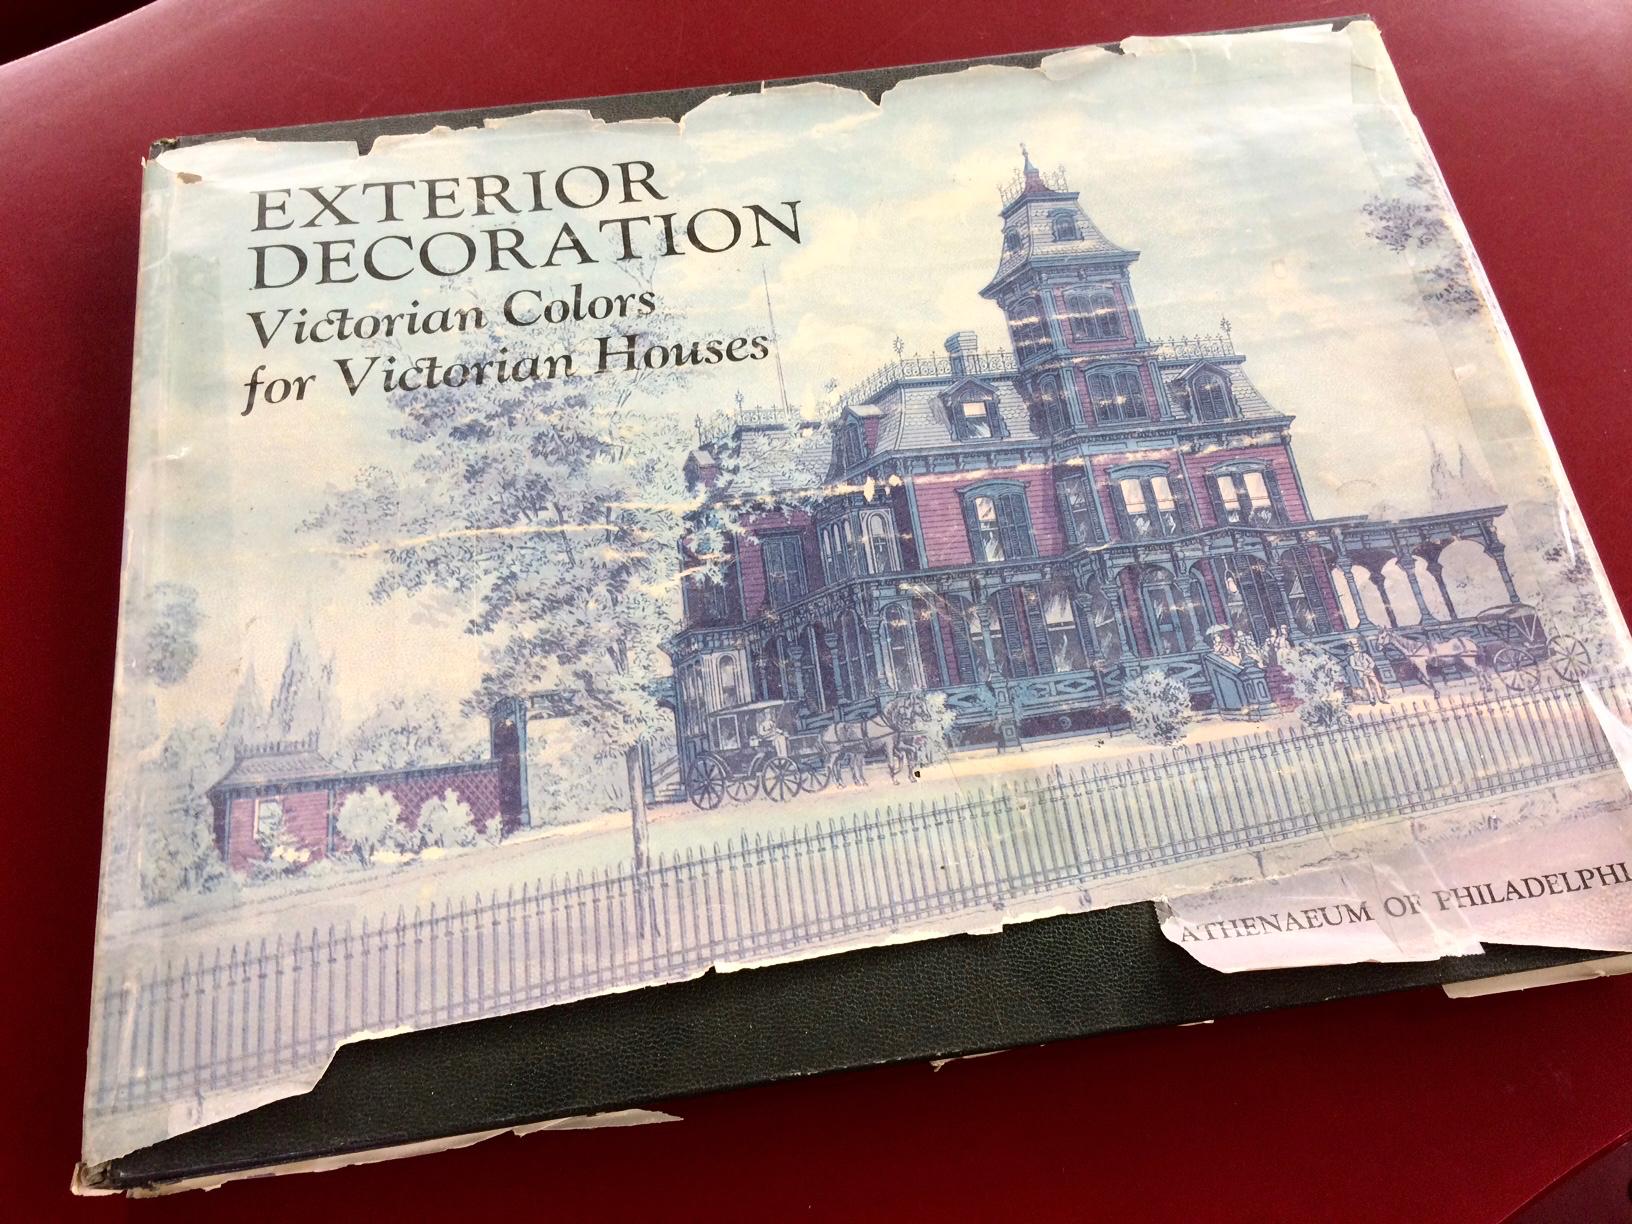 11-28-16-Exterior-decoration-book-cover.jpg